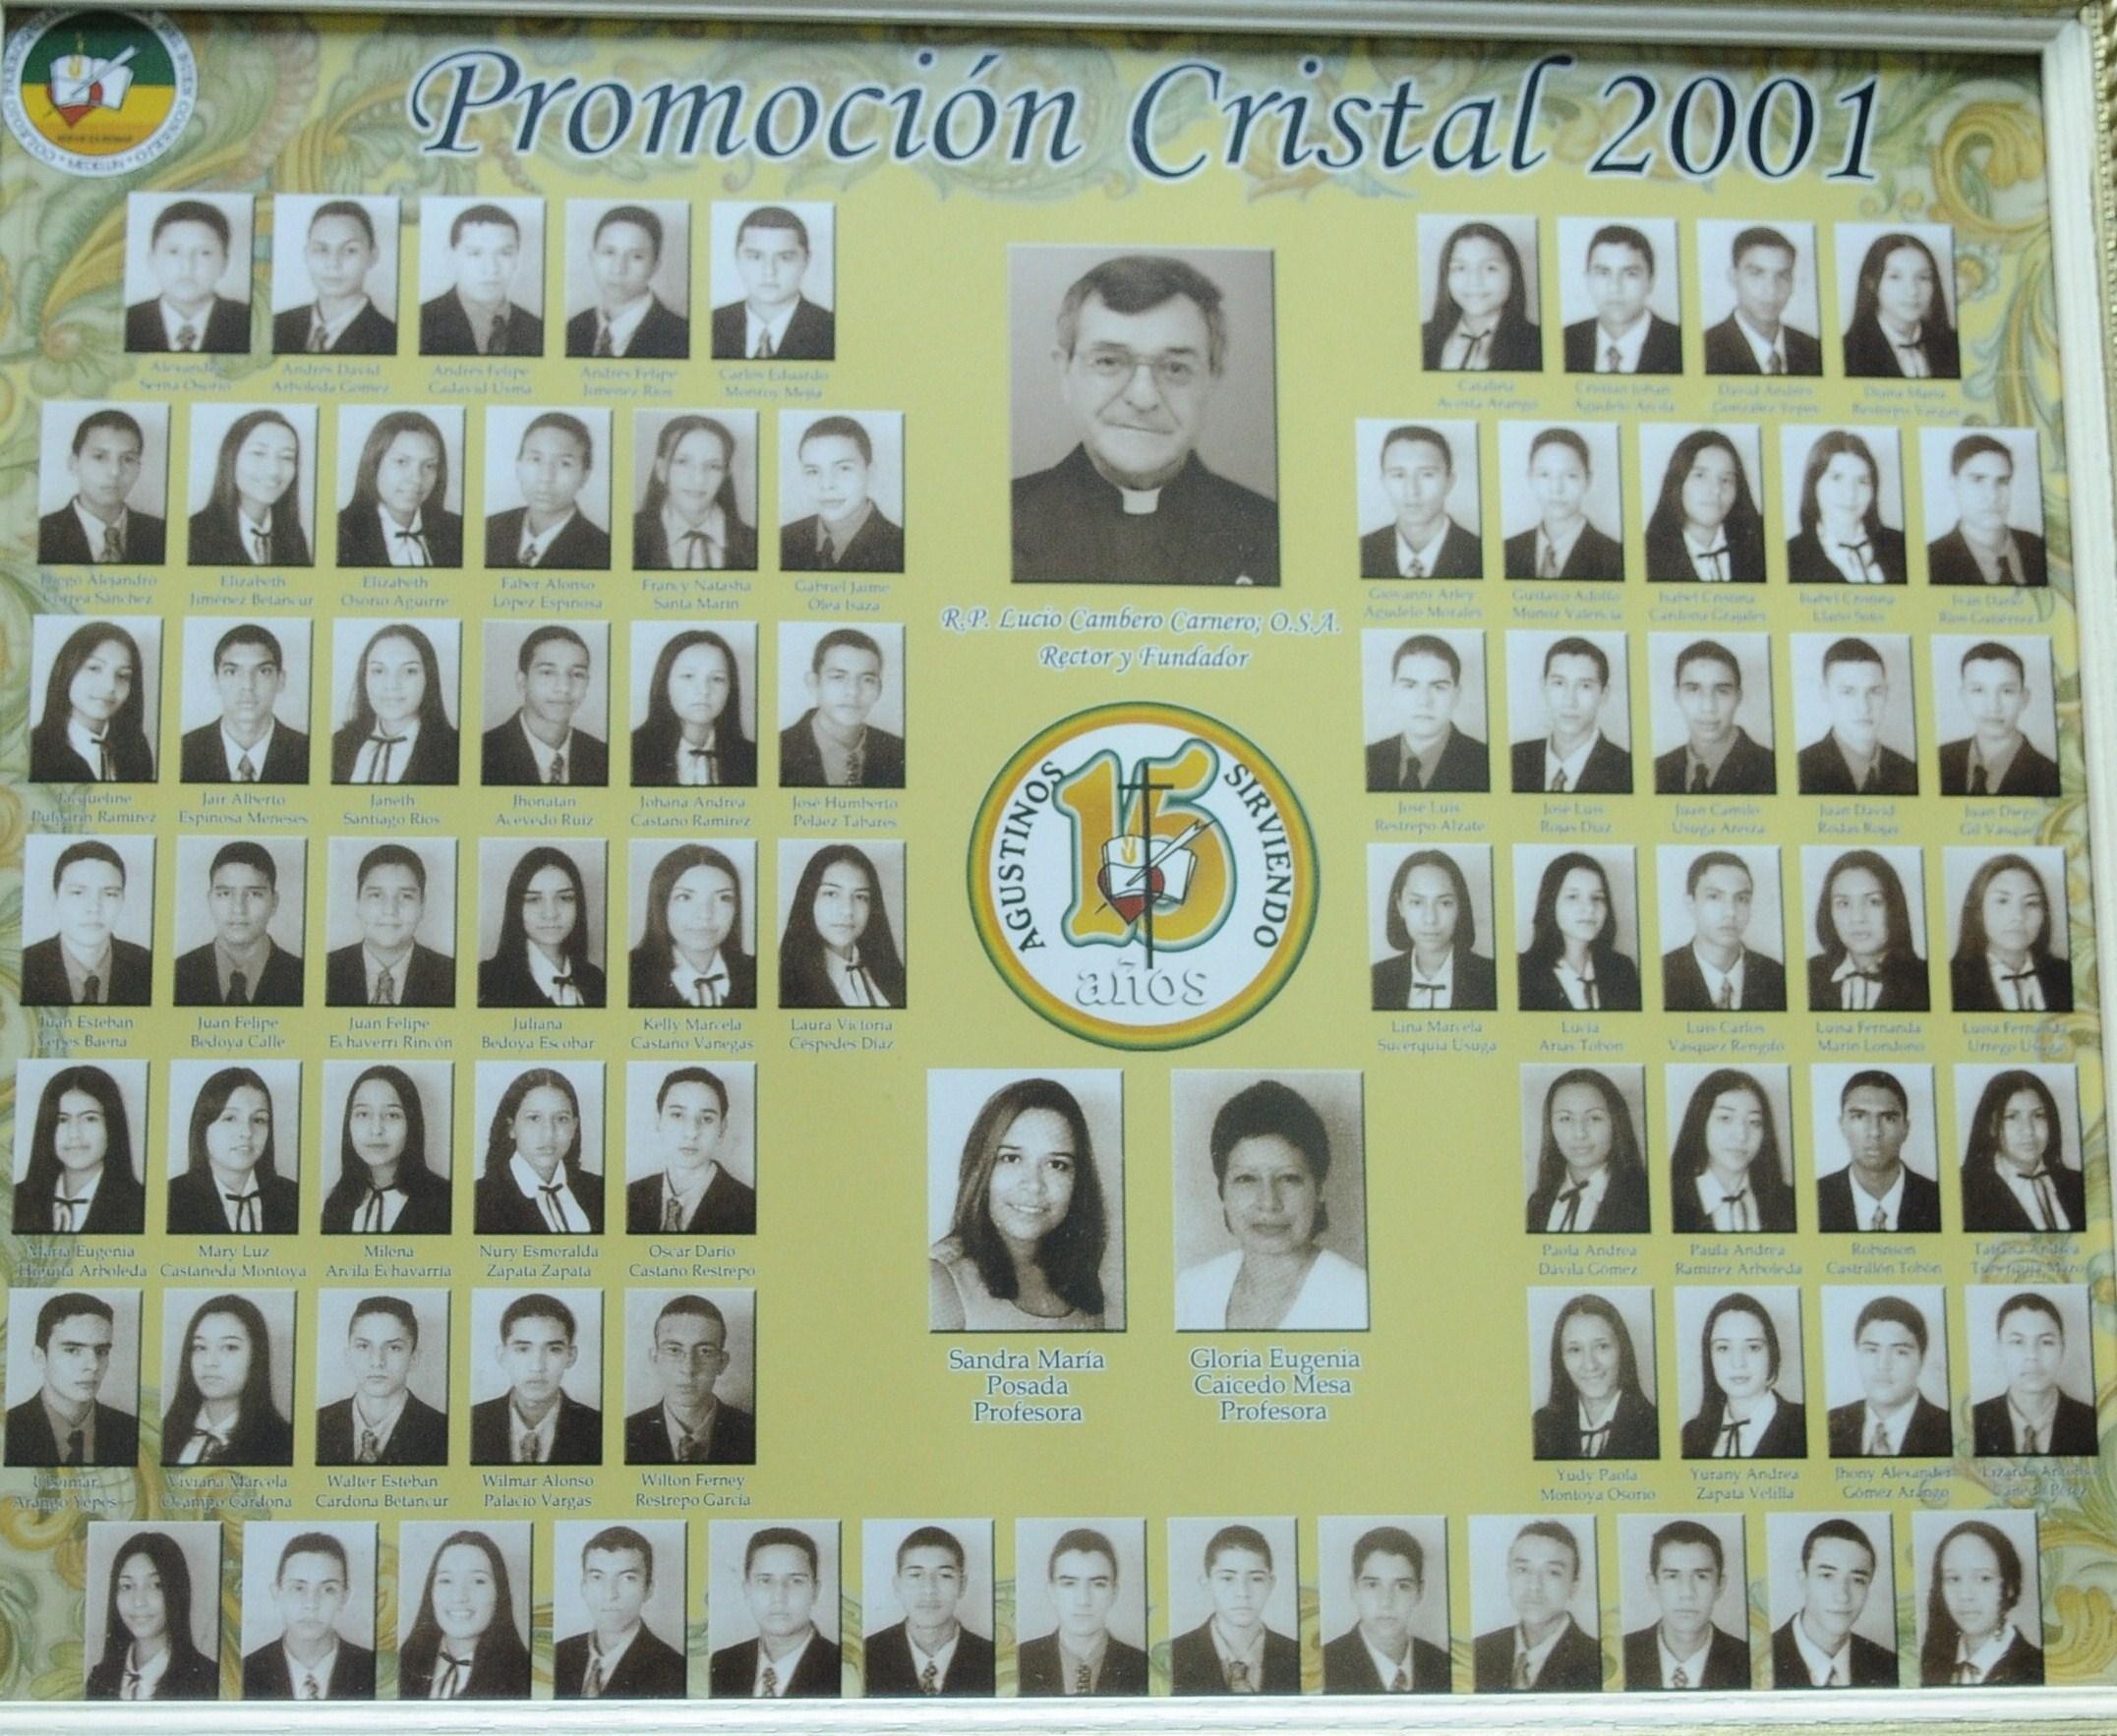 CRISTAL 2001